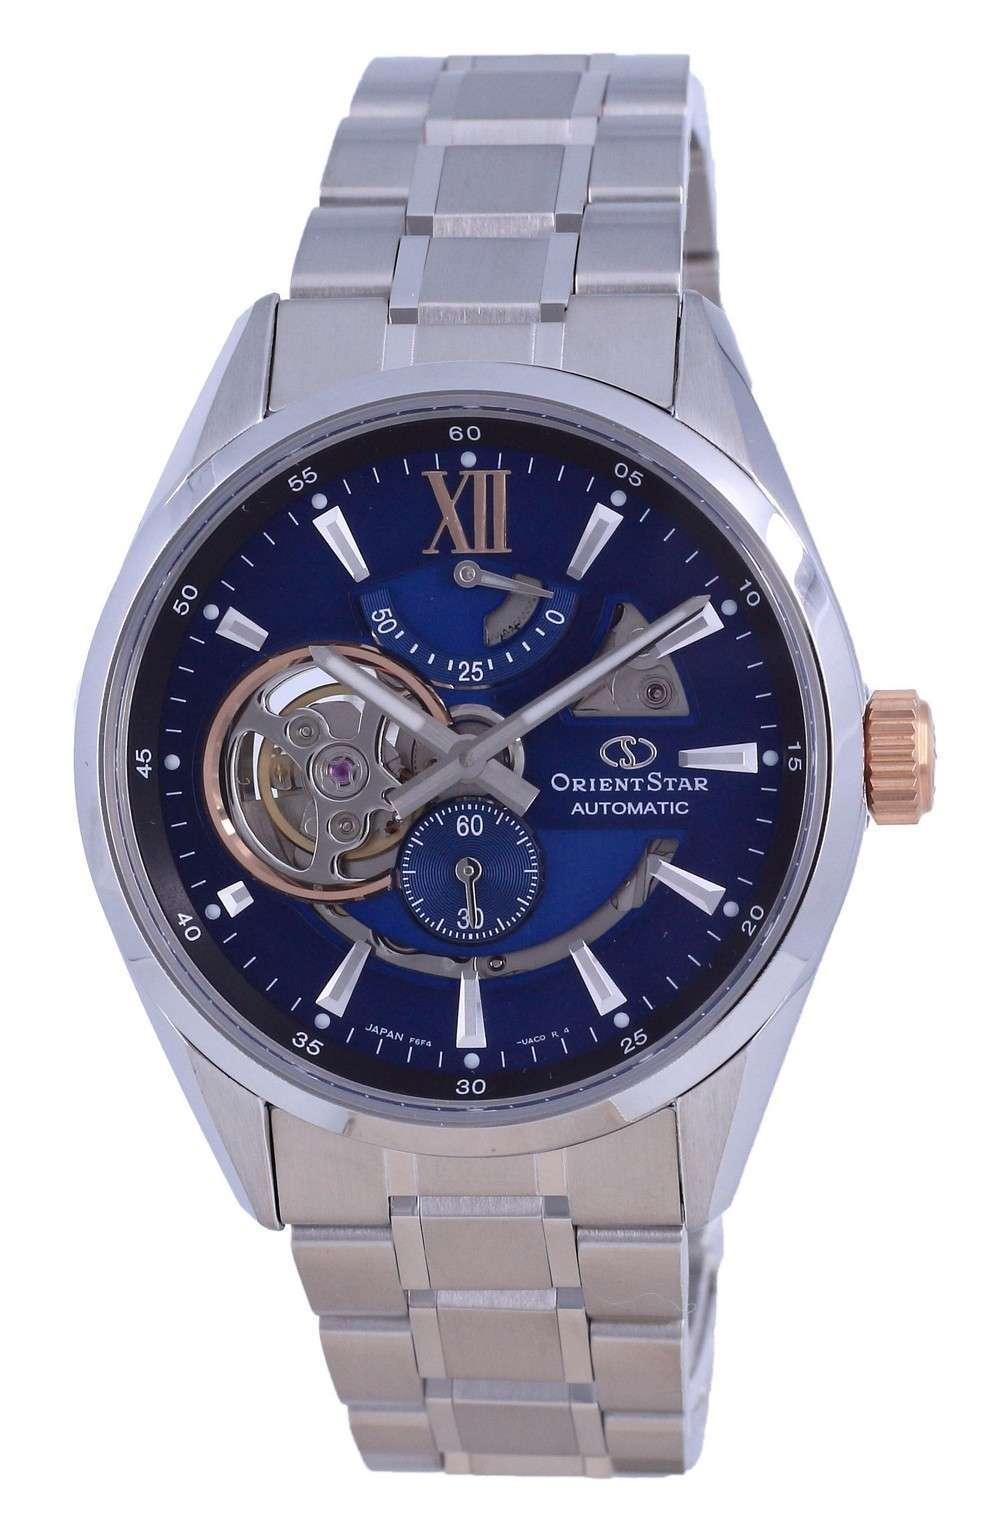 Orient Star Contemporary Limited Edition Open Heart Automatic RE-AV0116L00B 100M Reloj para hombre